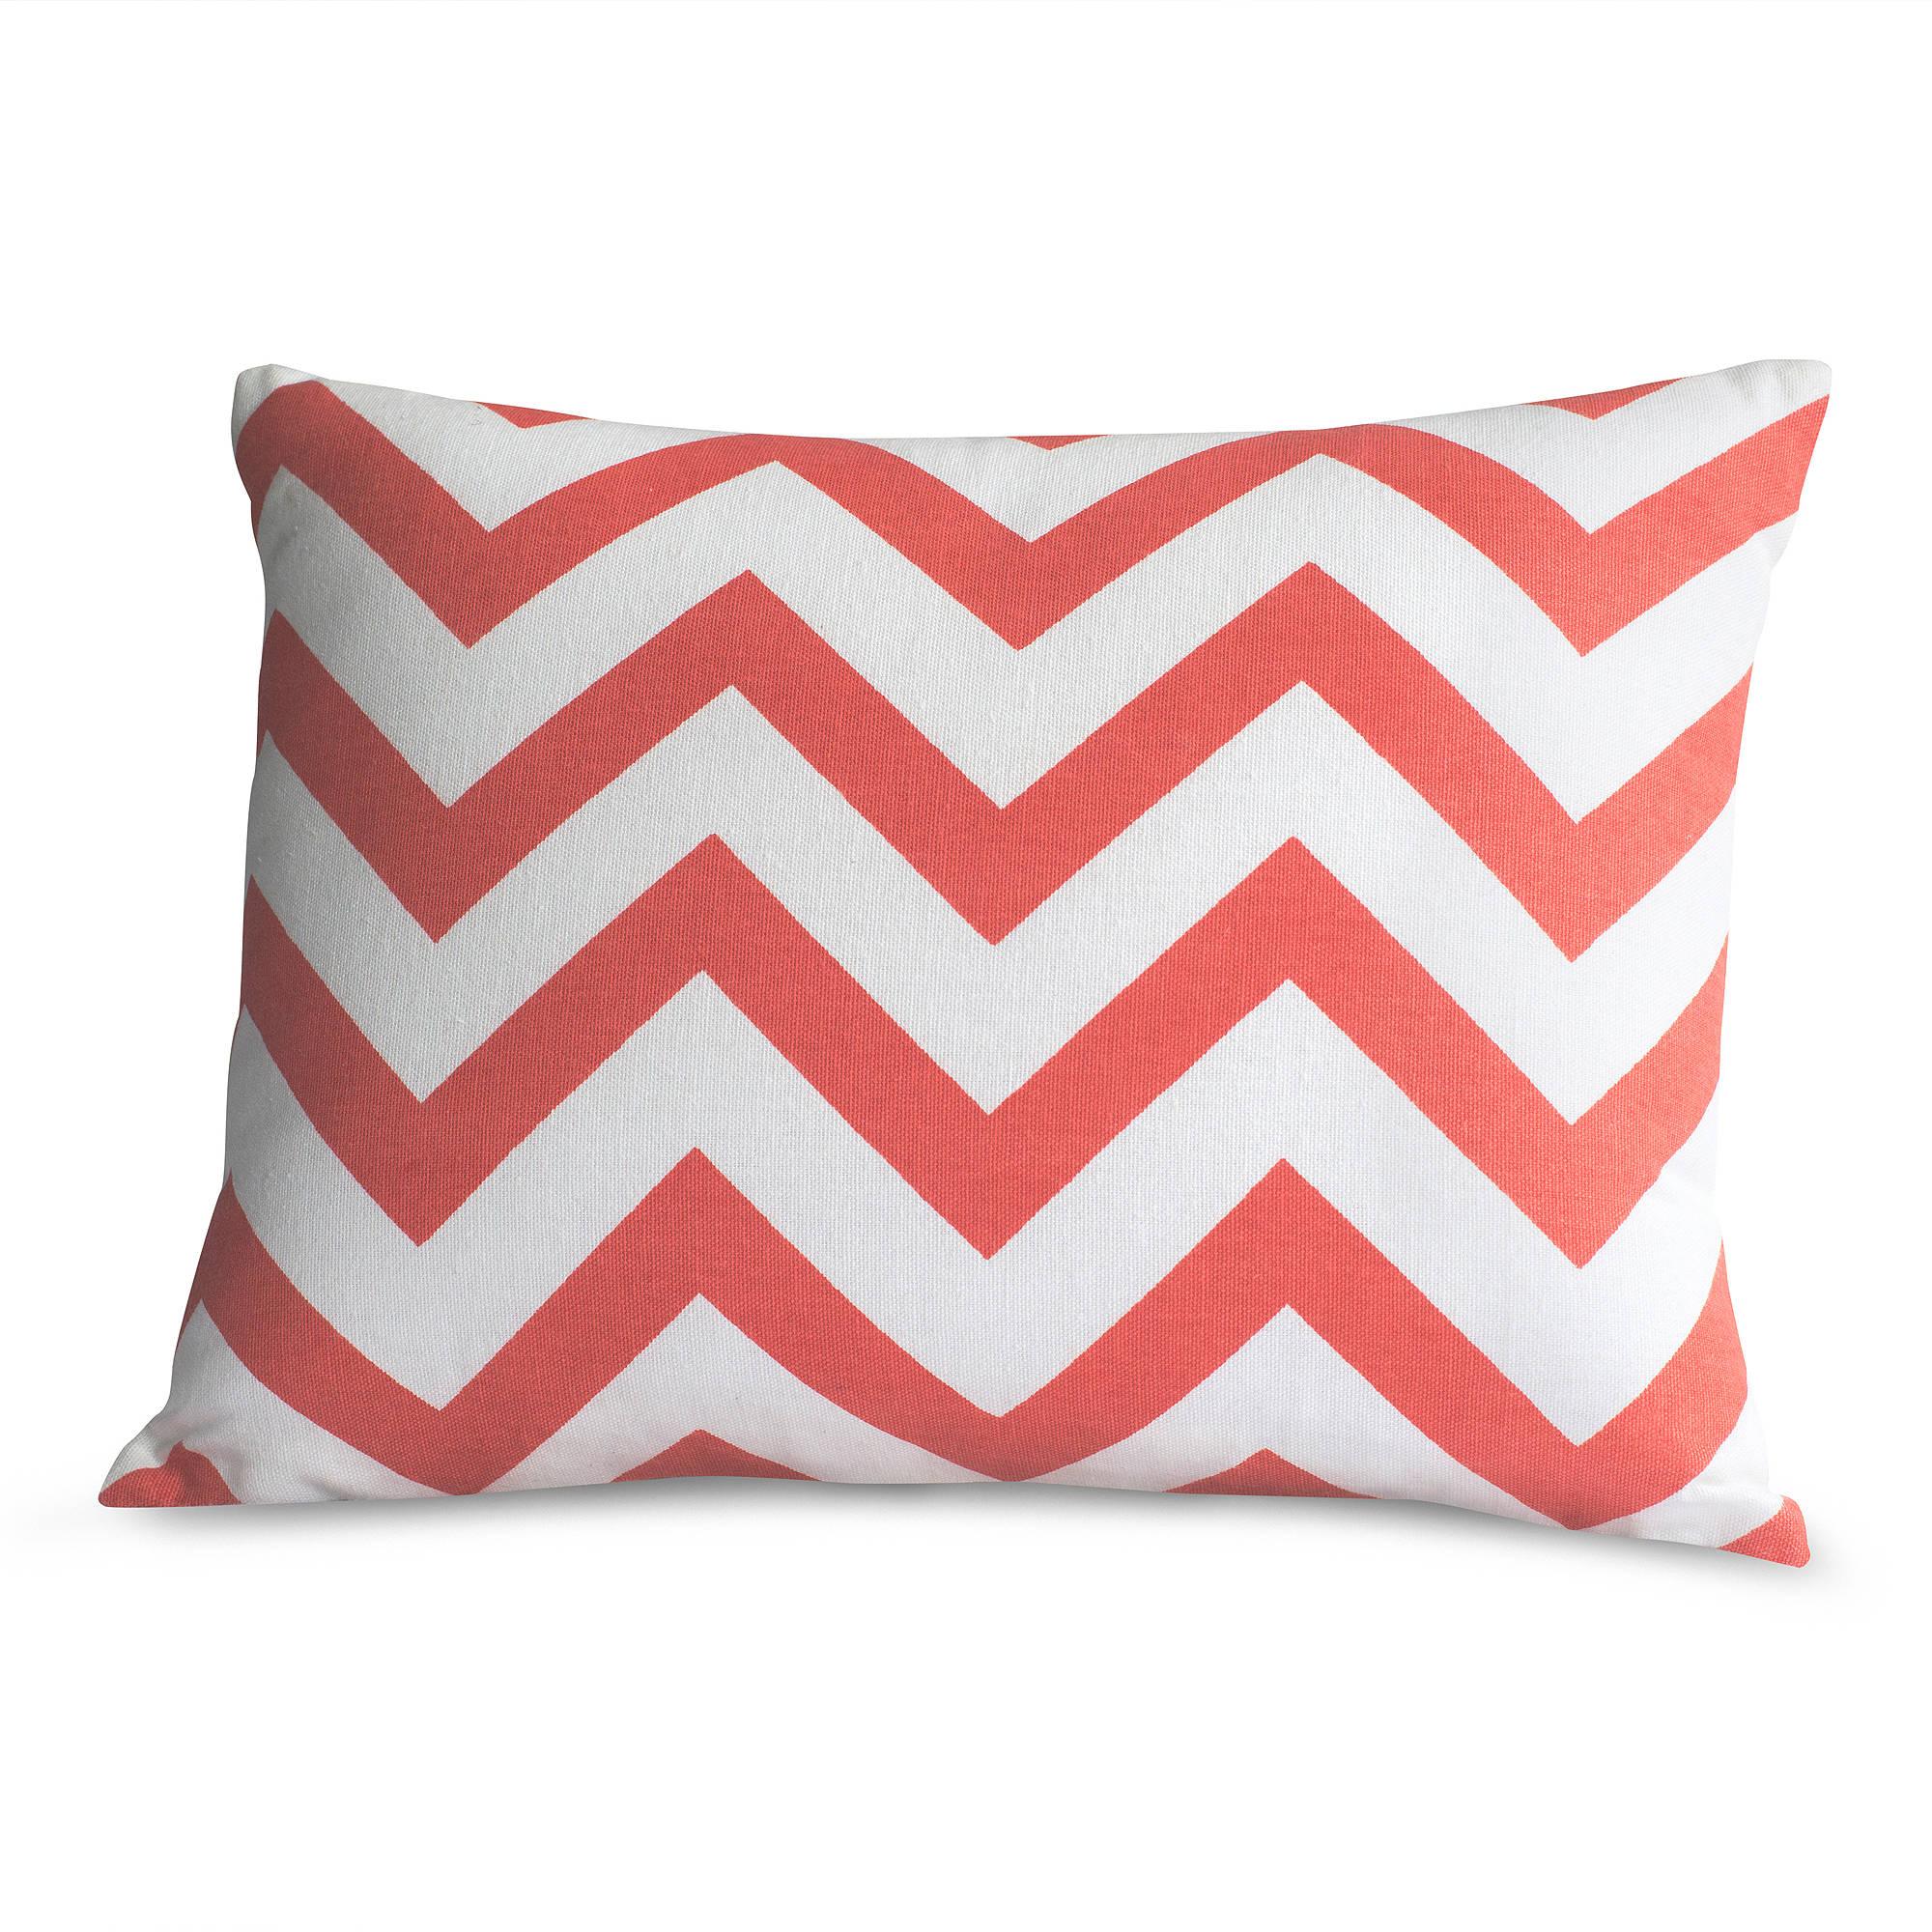 "Image of 9 By Novogratz 12"" X 16"" Pattern Play Decorative Pillow"